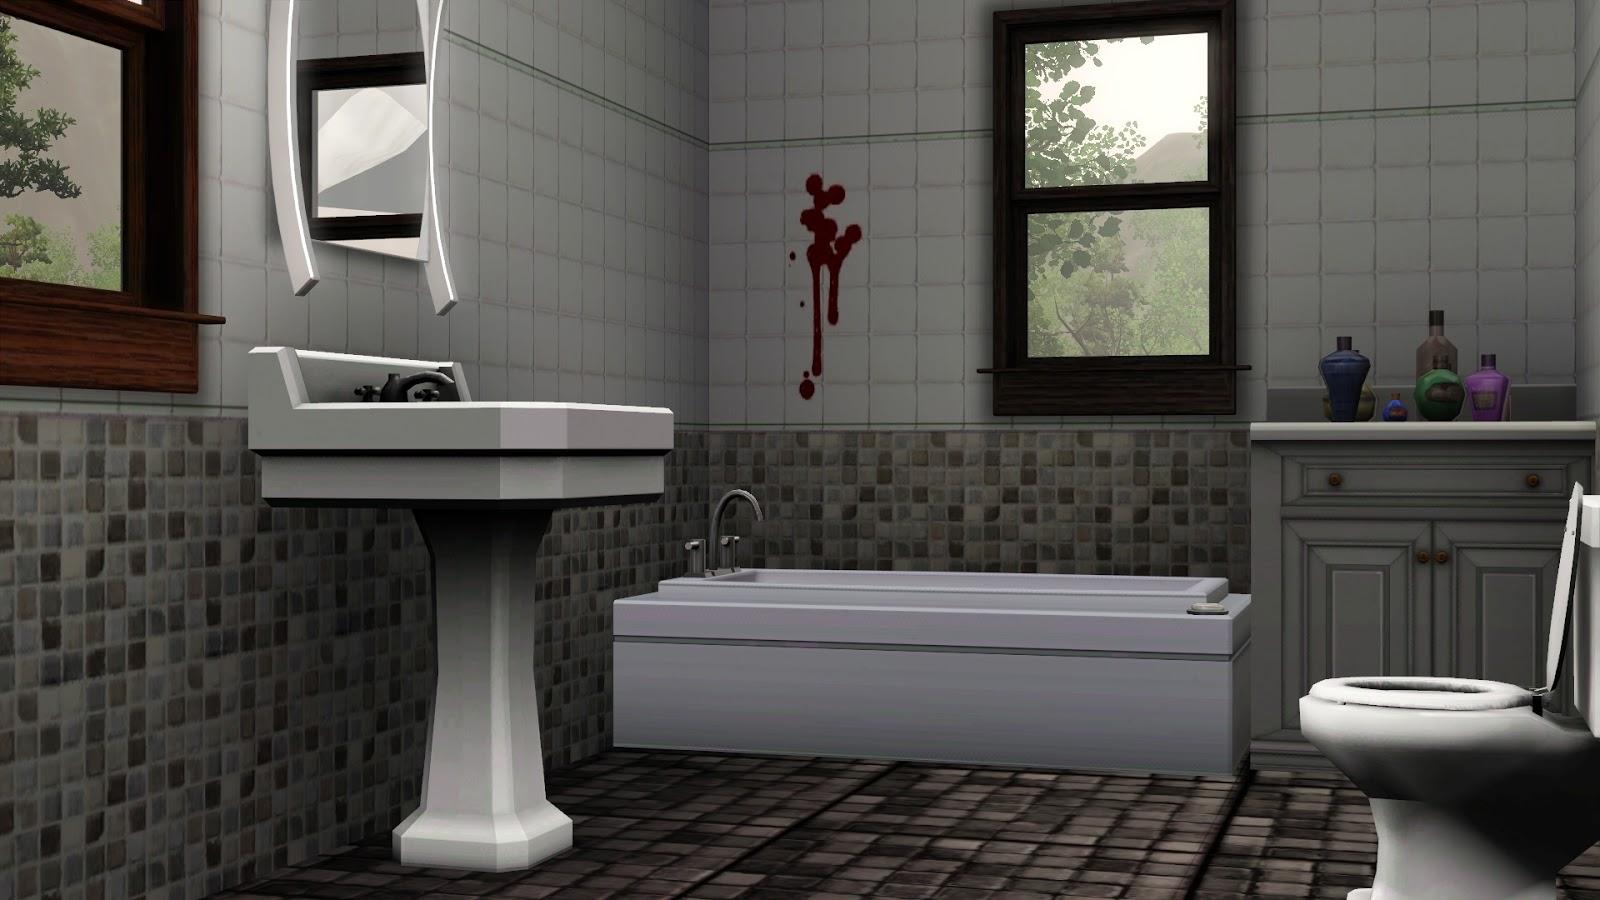 Brook studio bathroom tile splatter for Bathroom ideas sims 3